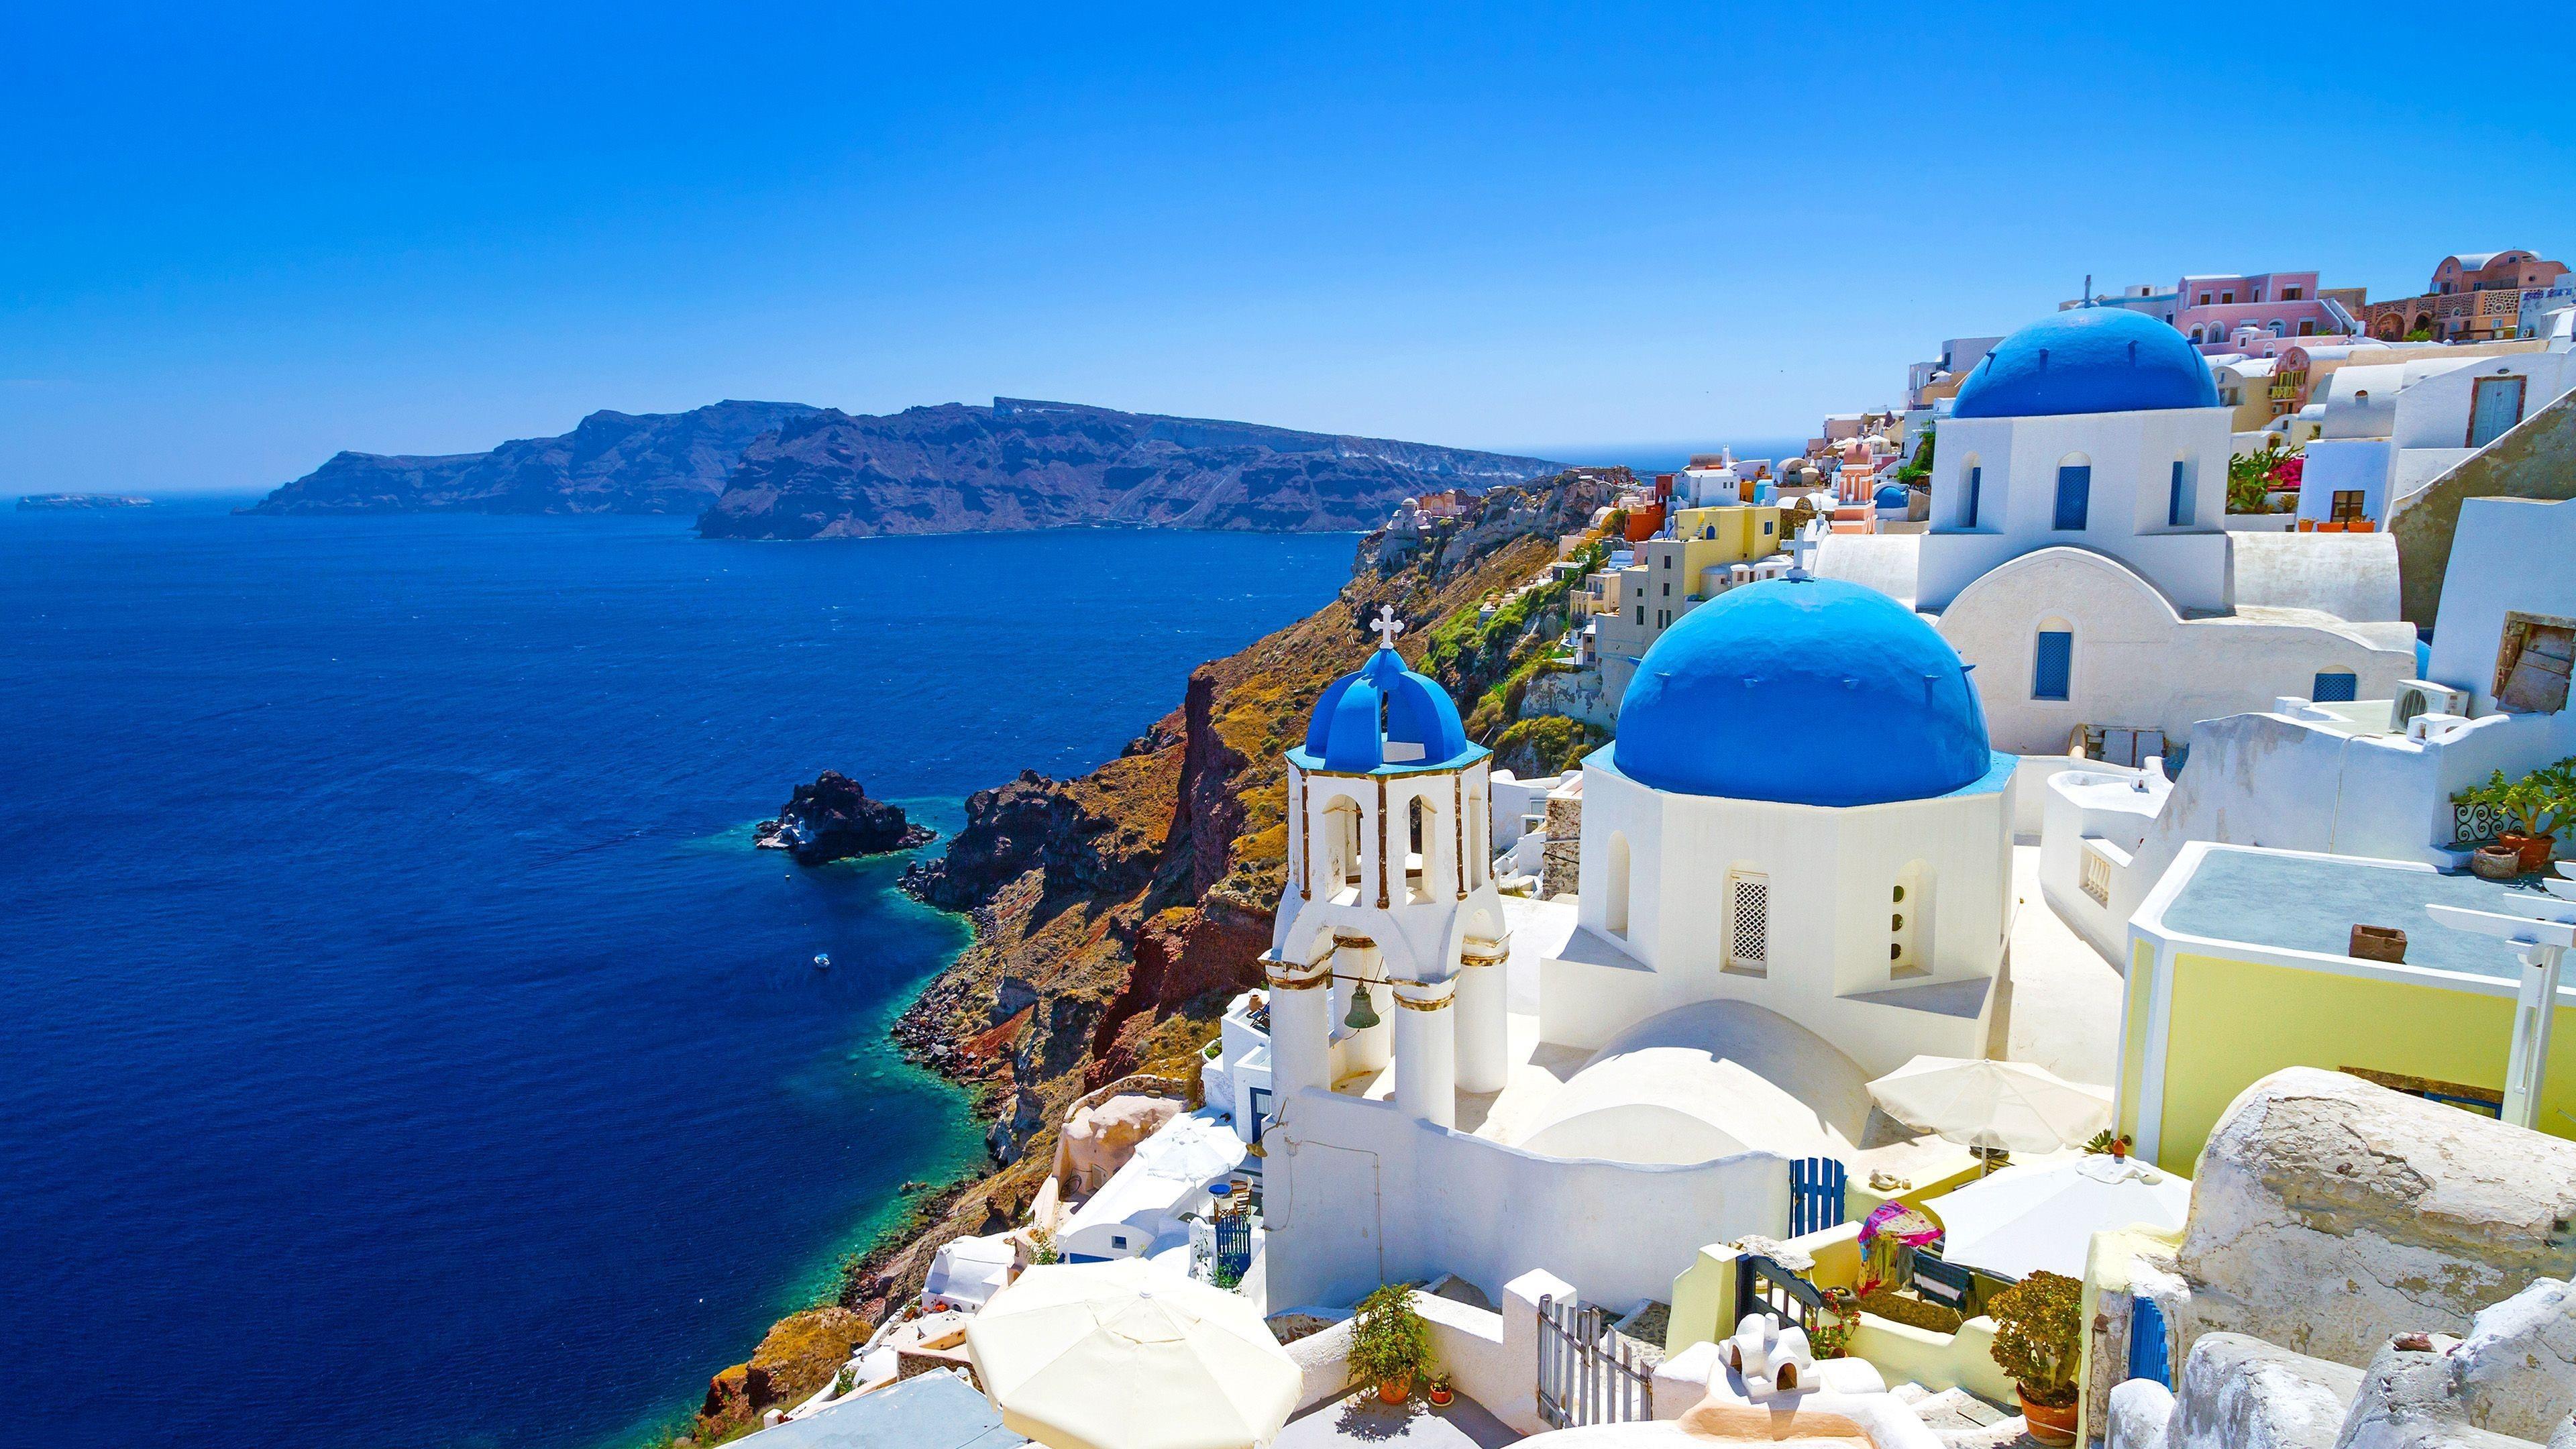 70 Santorini Wallpapers   Download at WallpaperBro 3840x2160